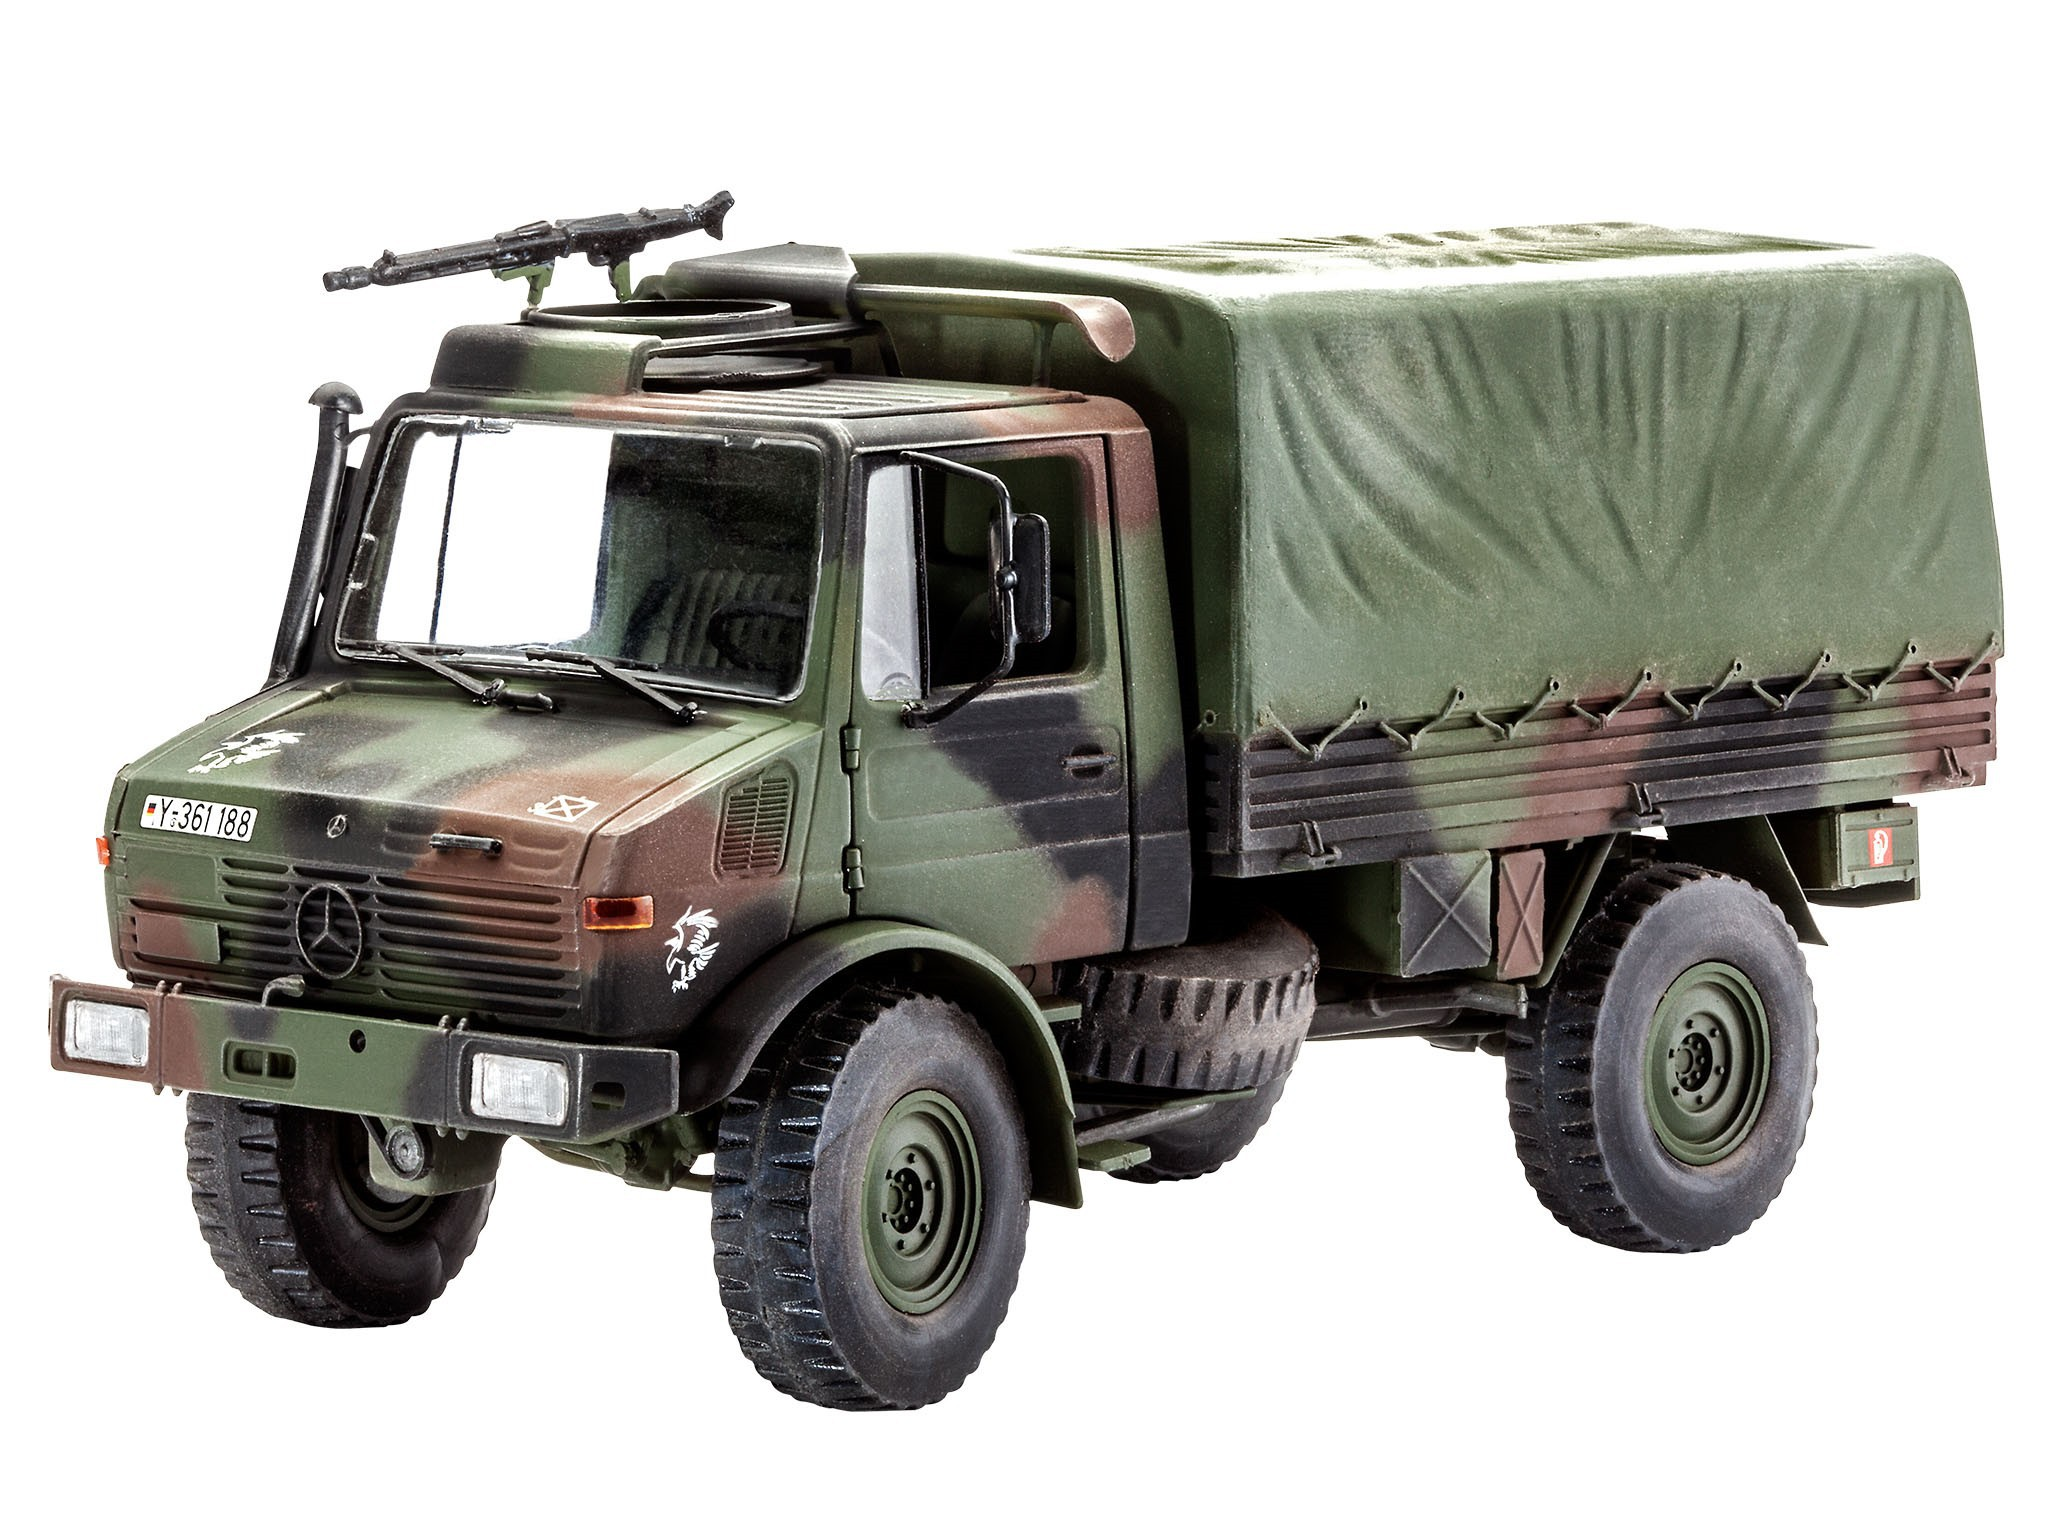 revell 03082 unimog lkw 2 tonnen tmilgl 1 35 bausatz modell transport bundeswehr ebay. Black Bedroom Furniture Sets. Home Design Ideas